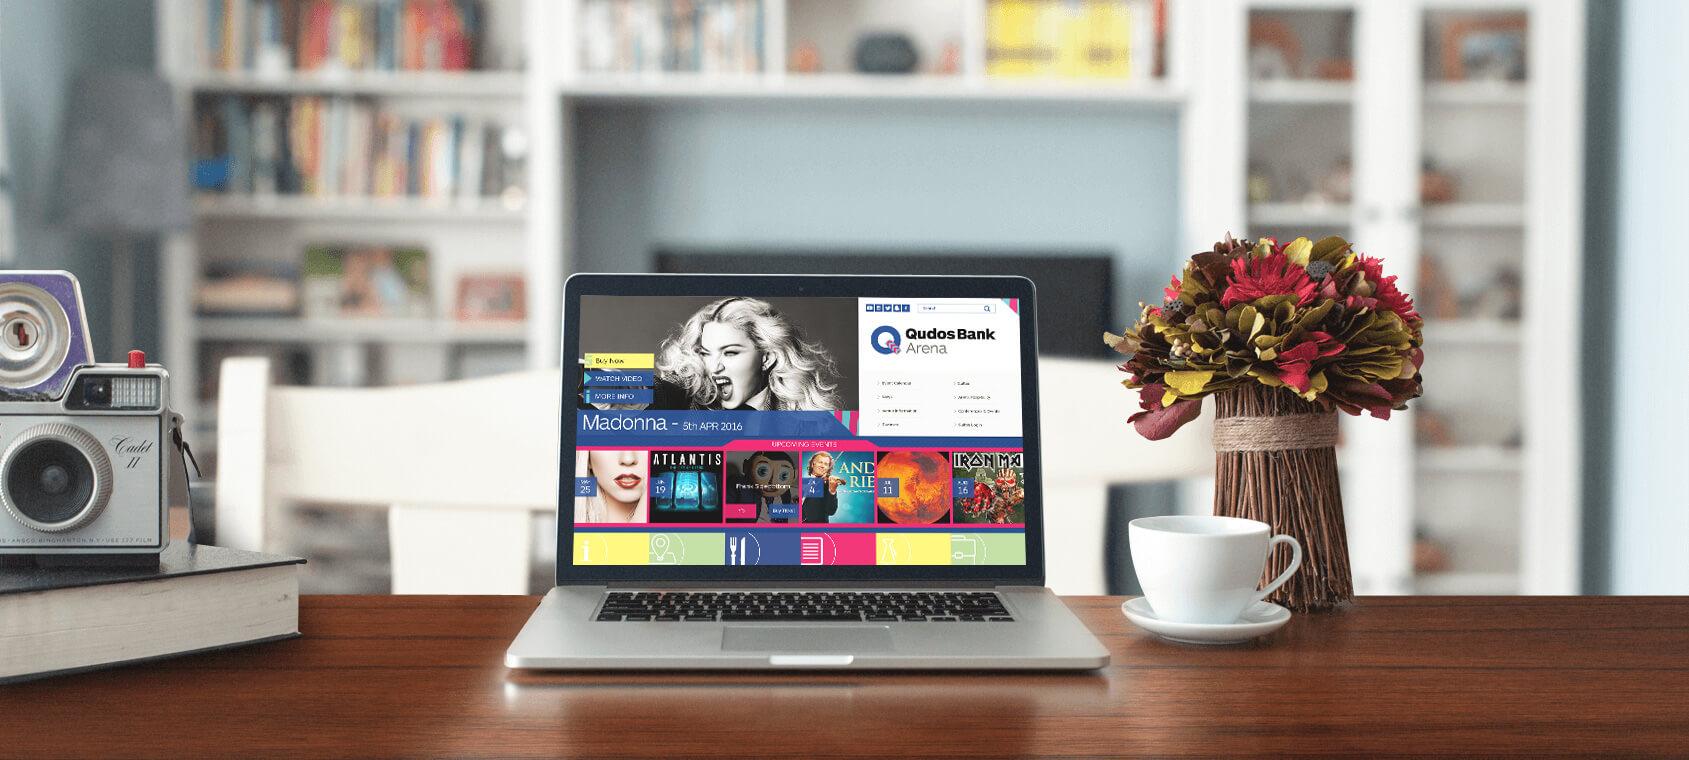 avalde-capabilities-slider-qudosbankarena-macbook